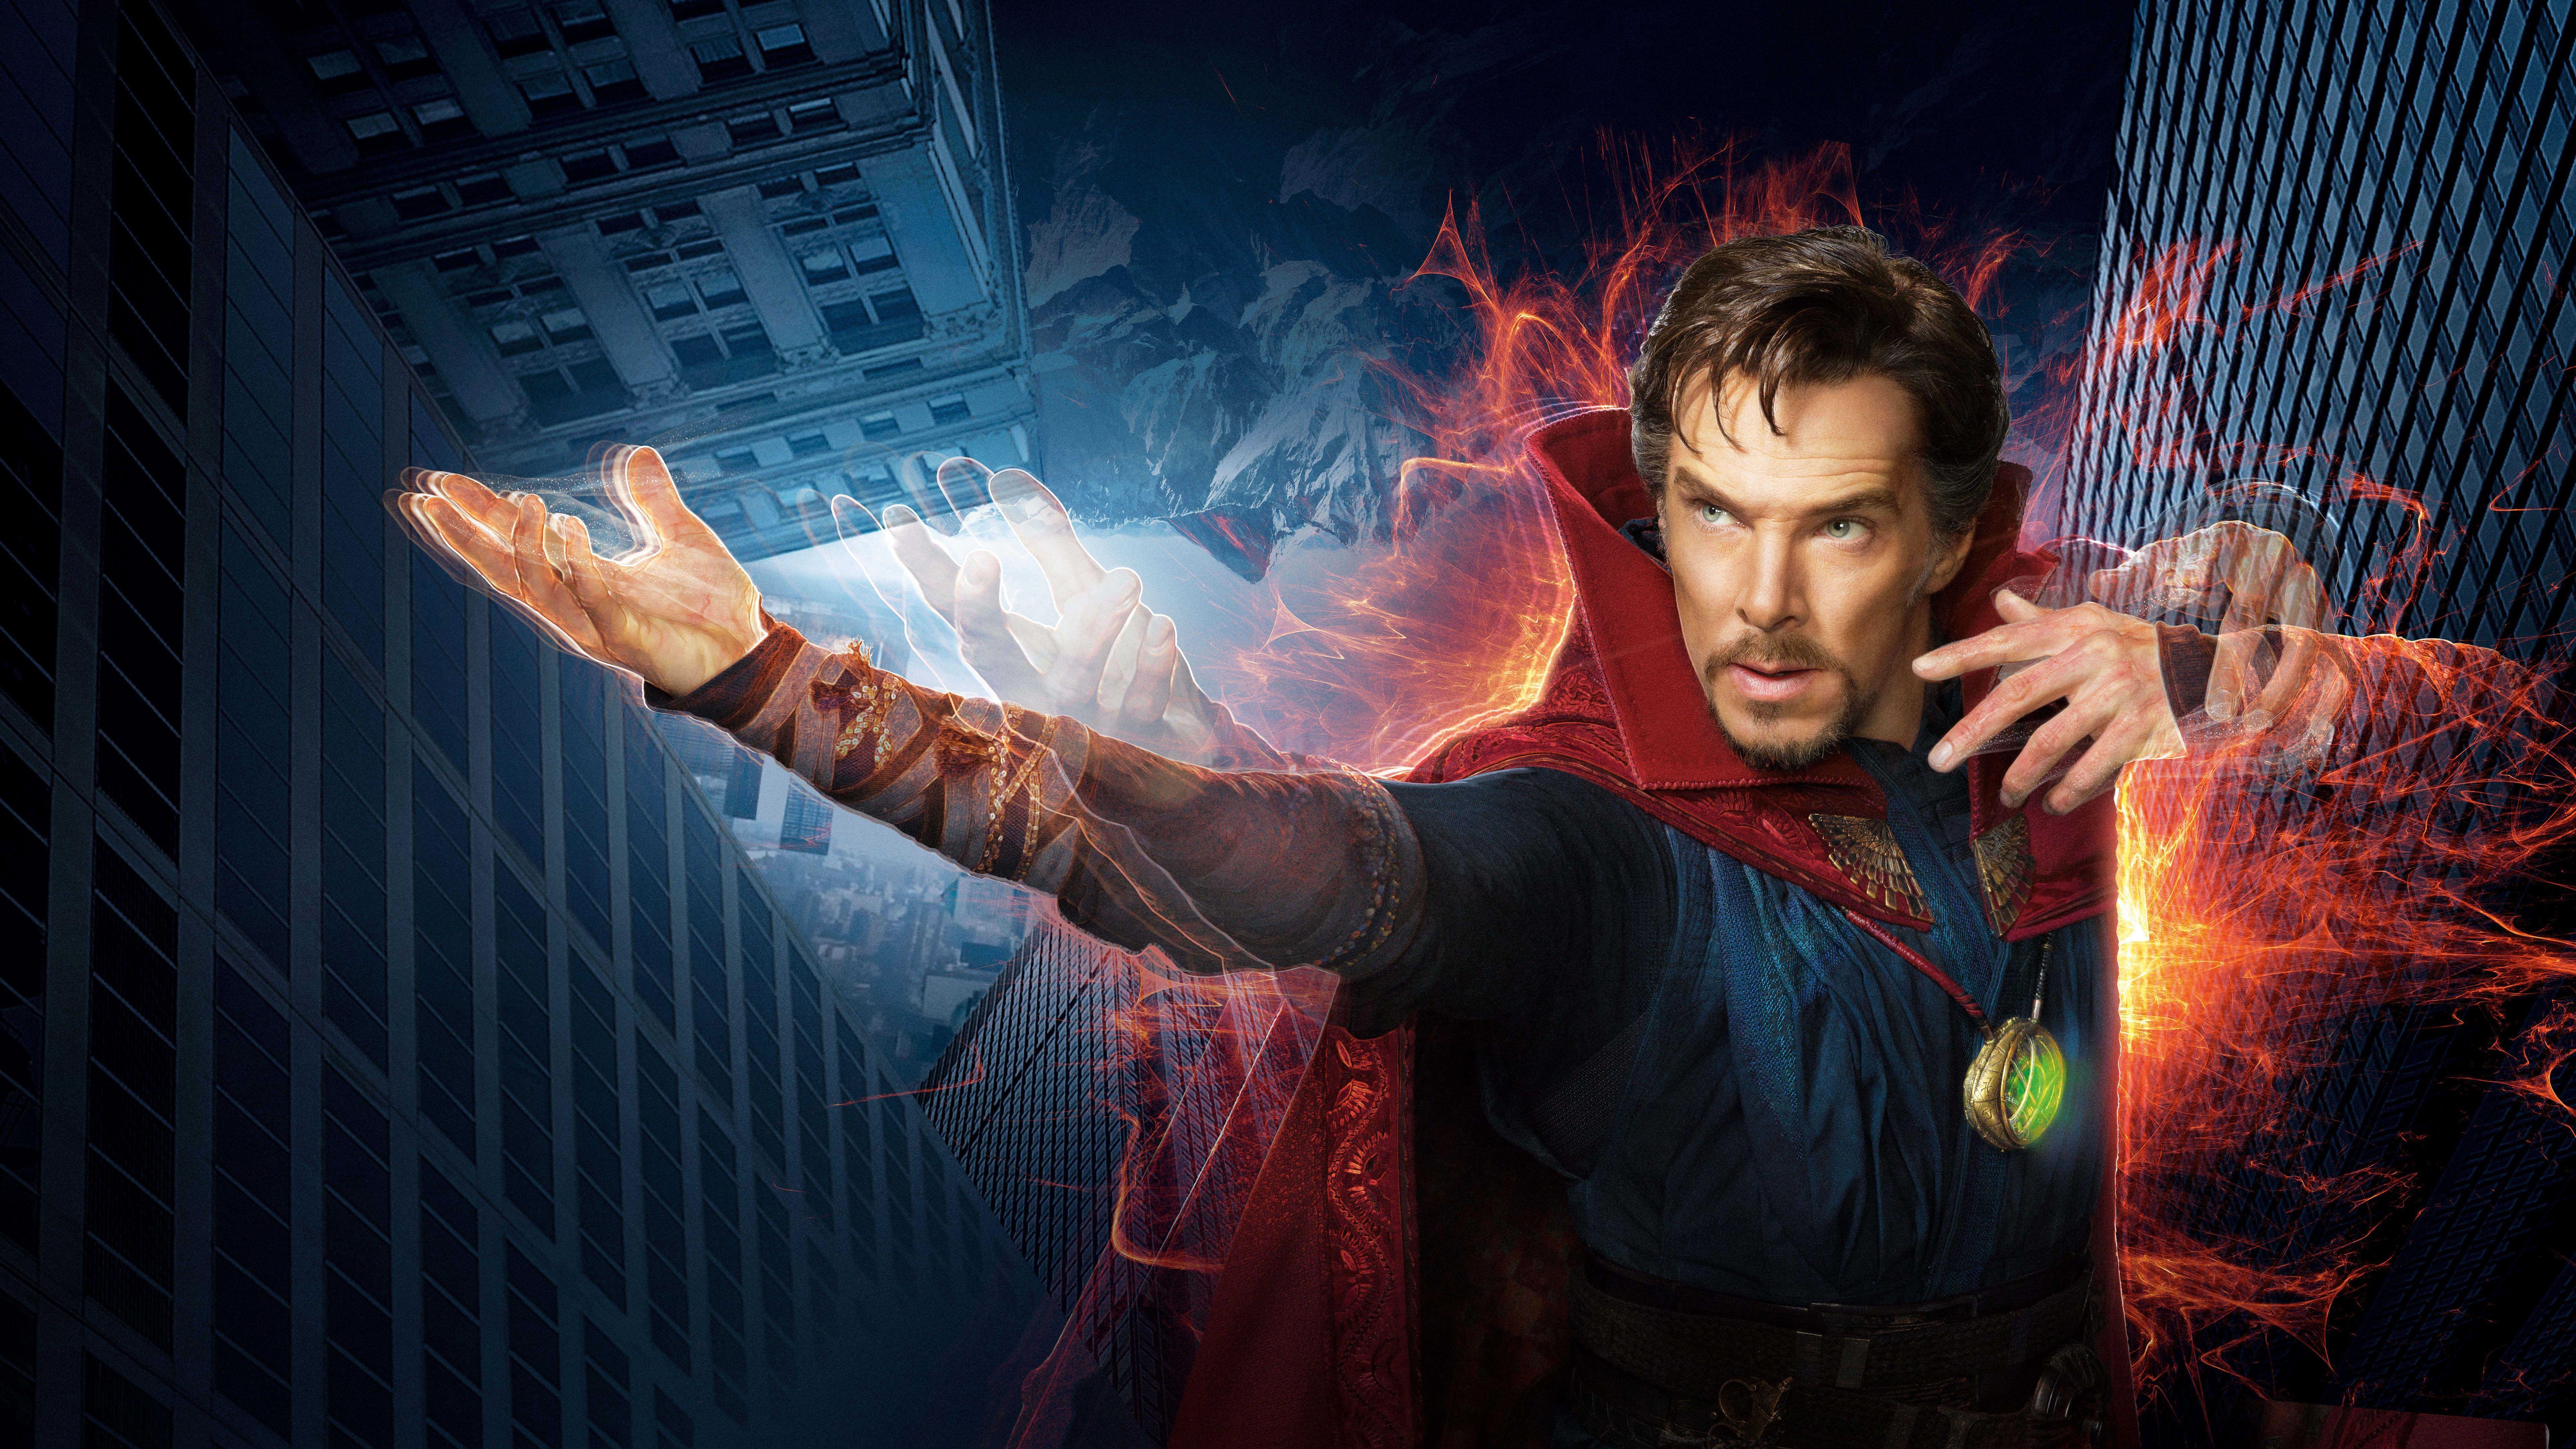 doctor strange movie download in hindi 1080p